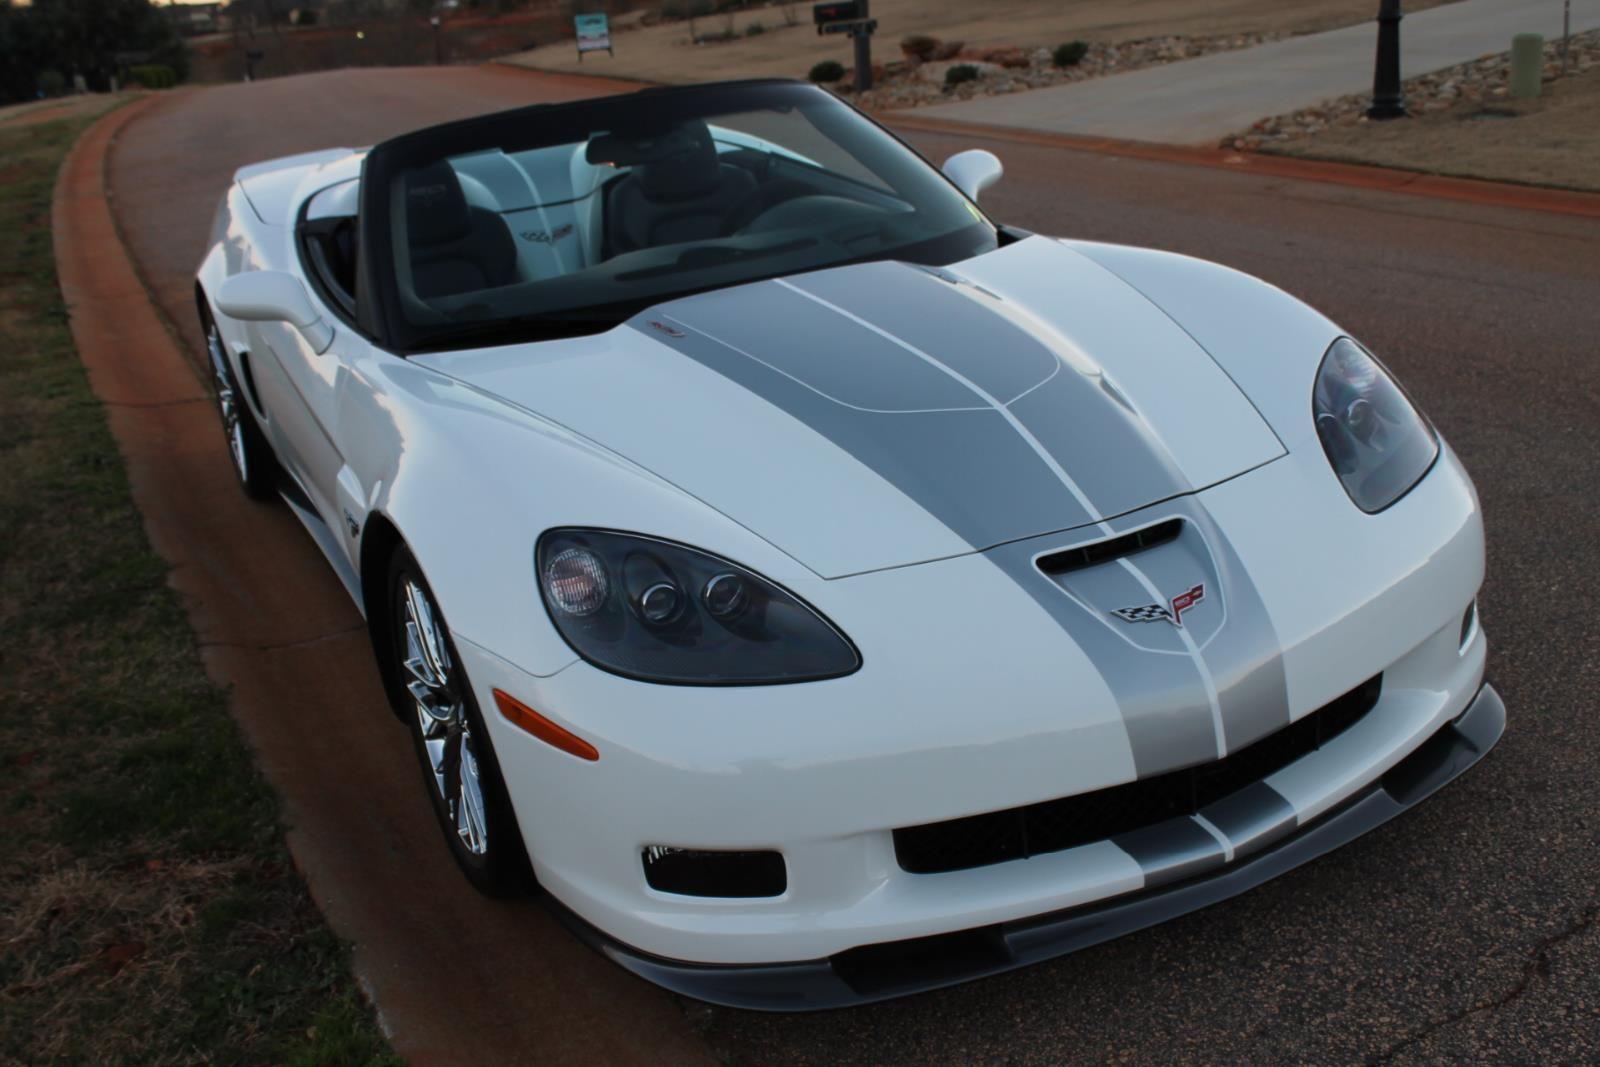 Free Ebay Image Gallery Jpegbay Com Corvette Chevrolet Corvette Dream Cars